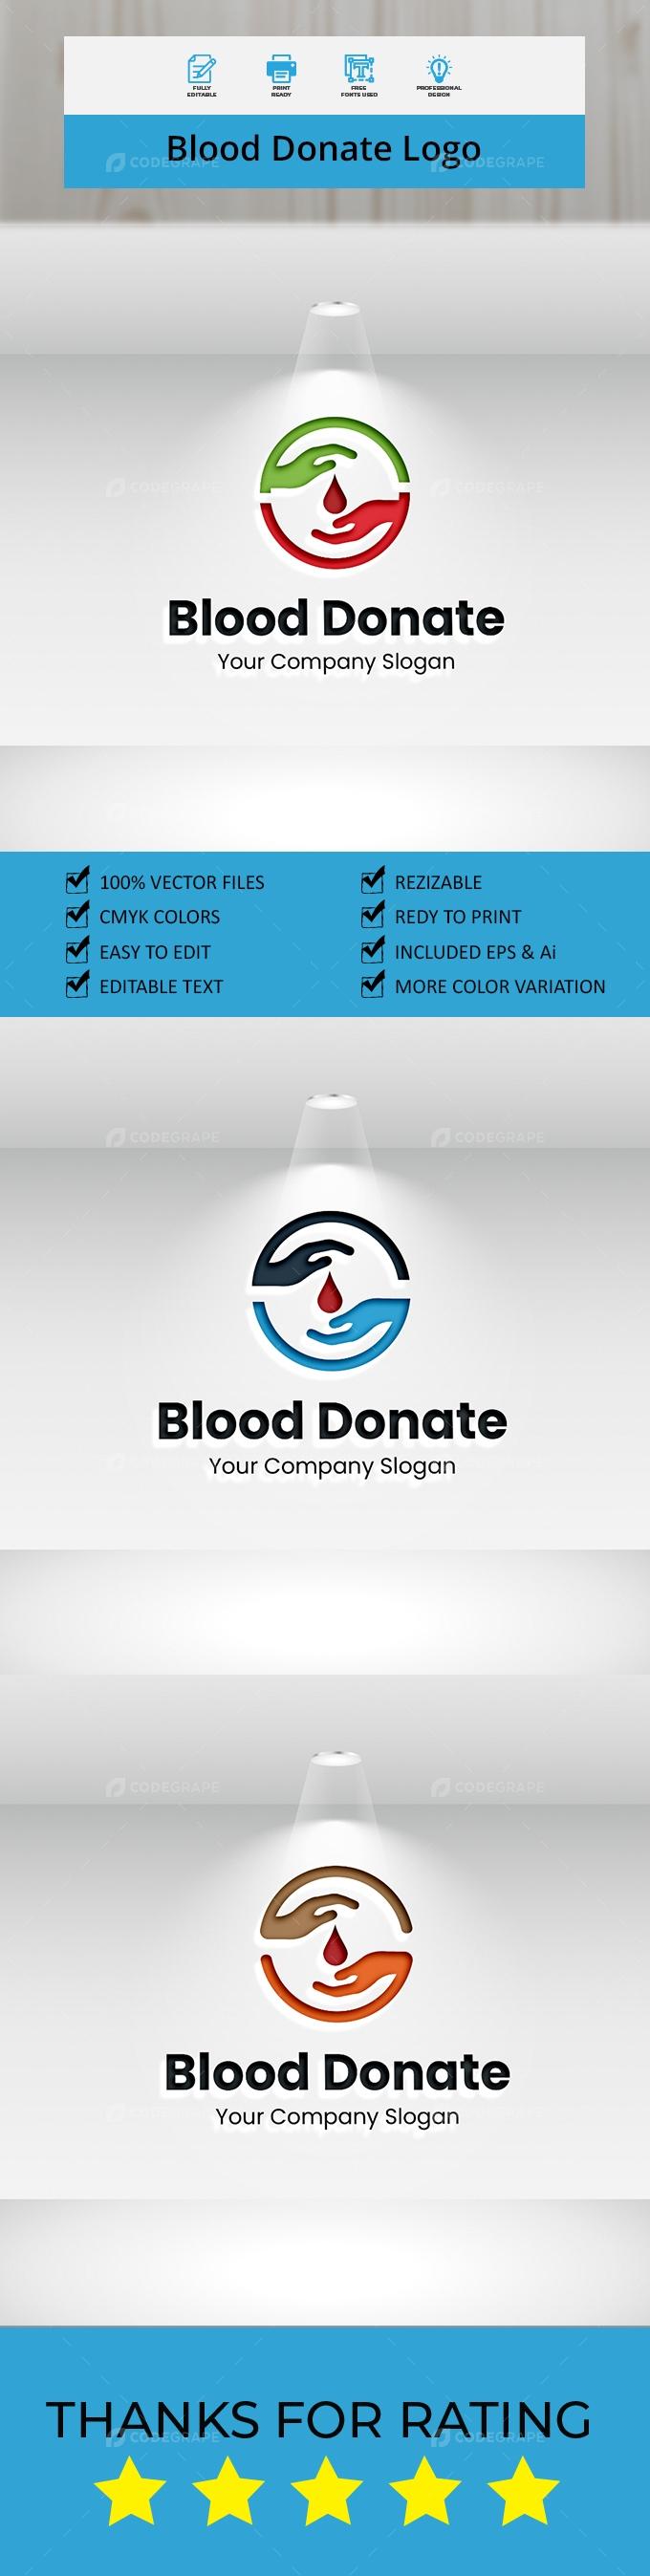 Blood Donate Logo template